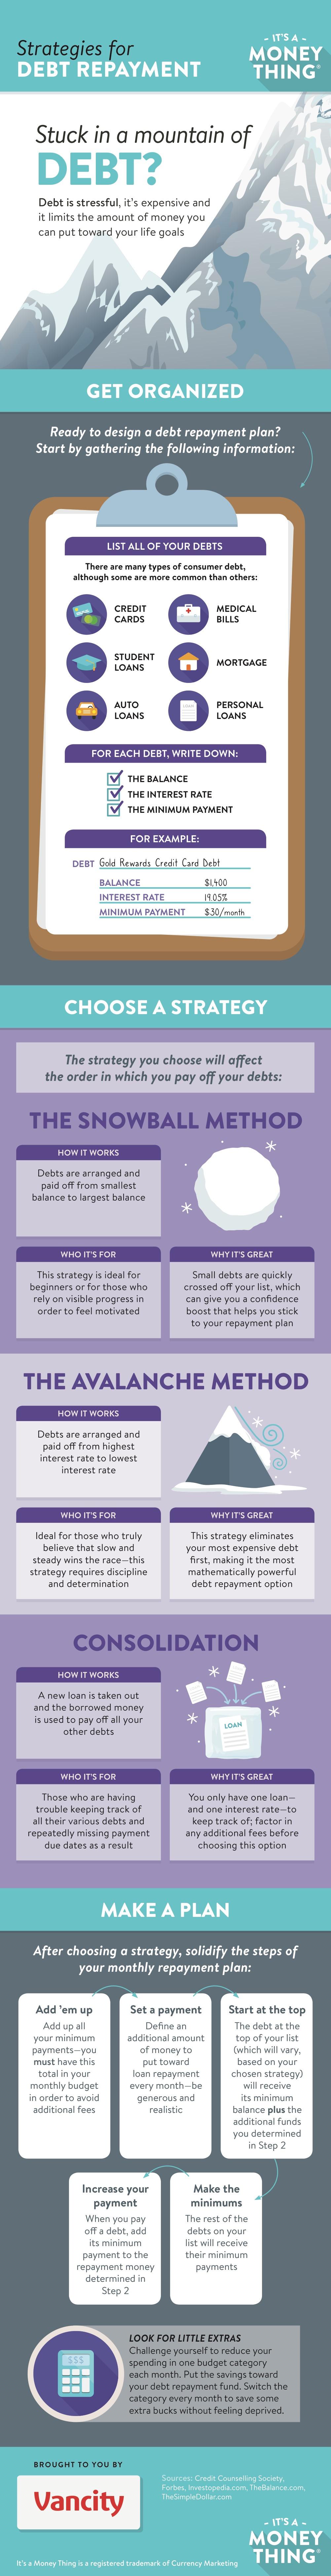 Infographic: Strategies for debt repayment